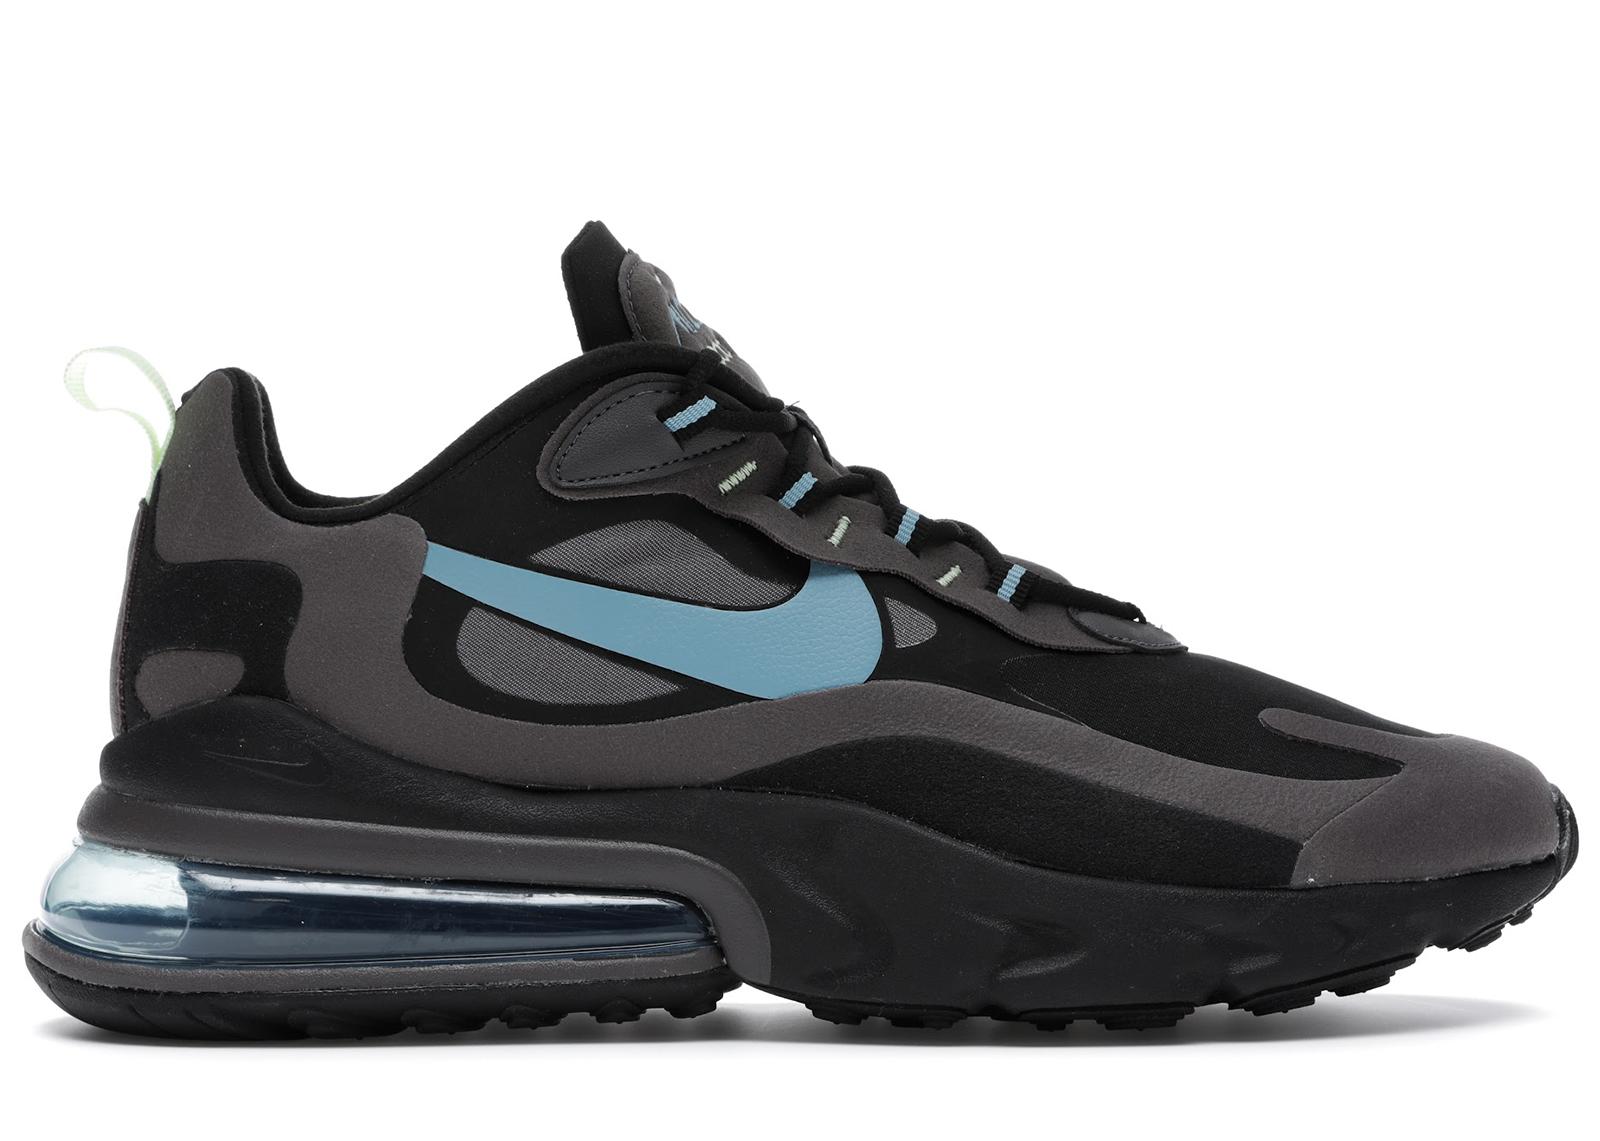 Nike Air Max 270 React Black Thunder